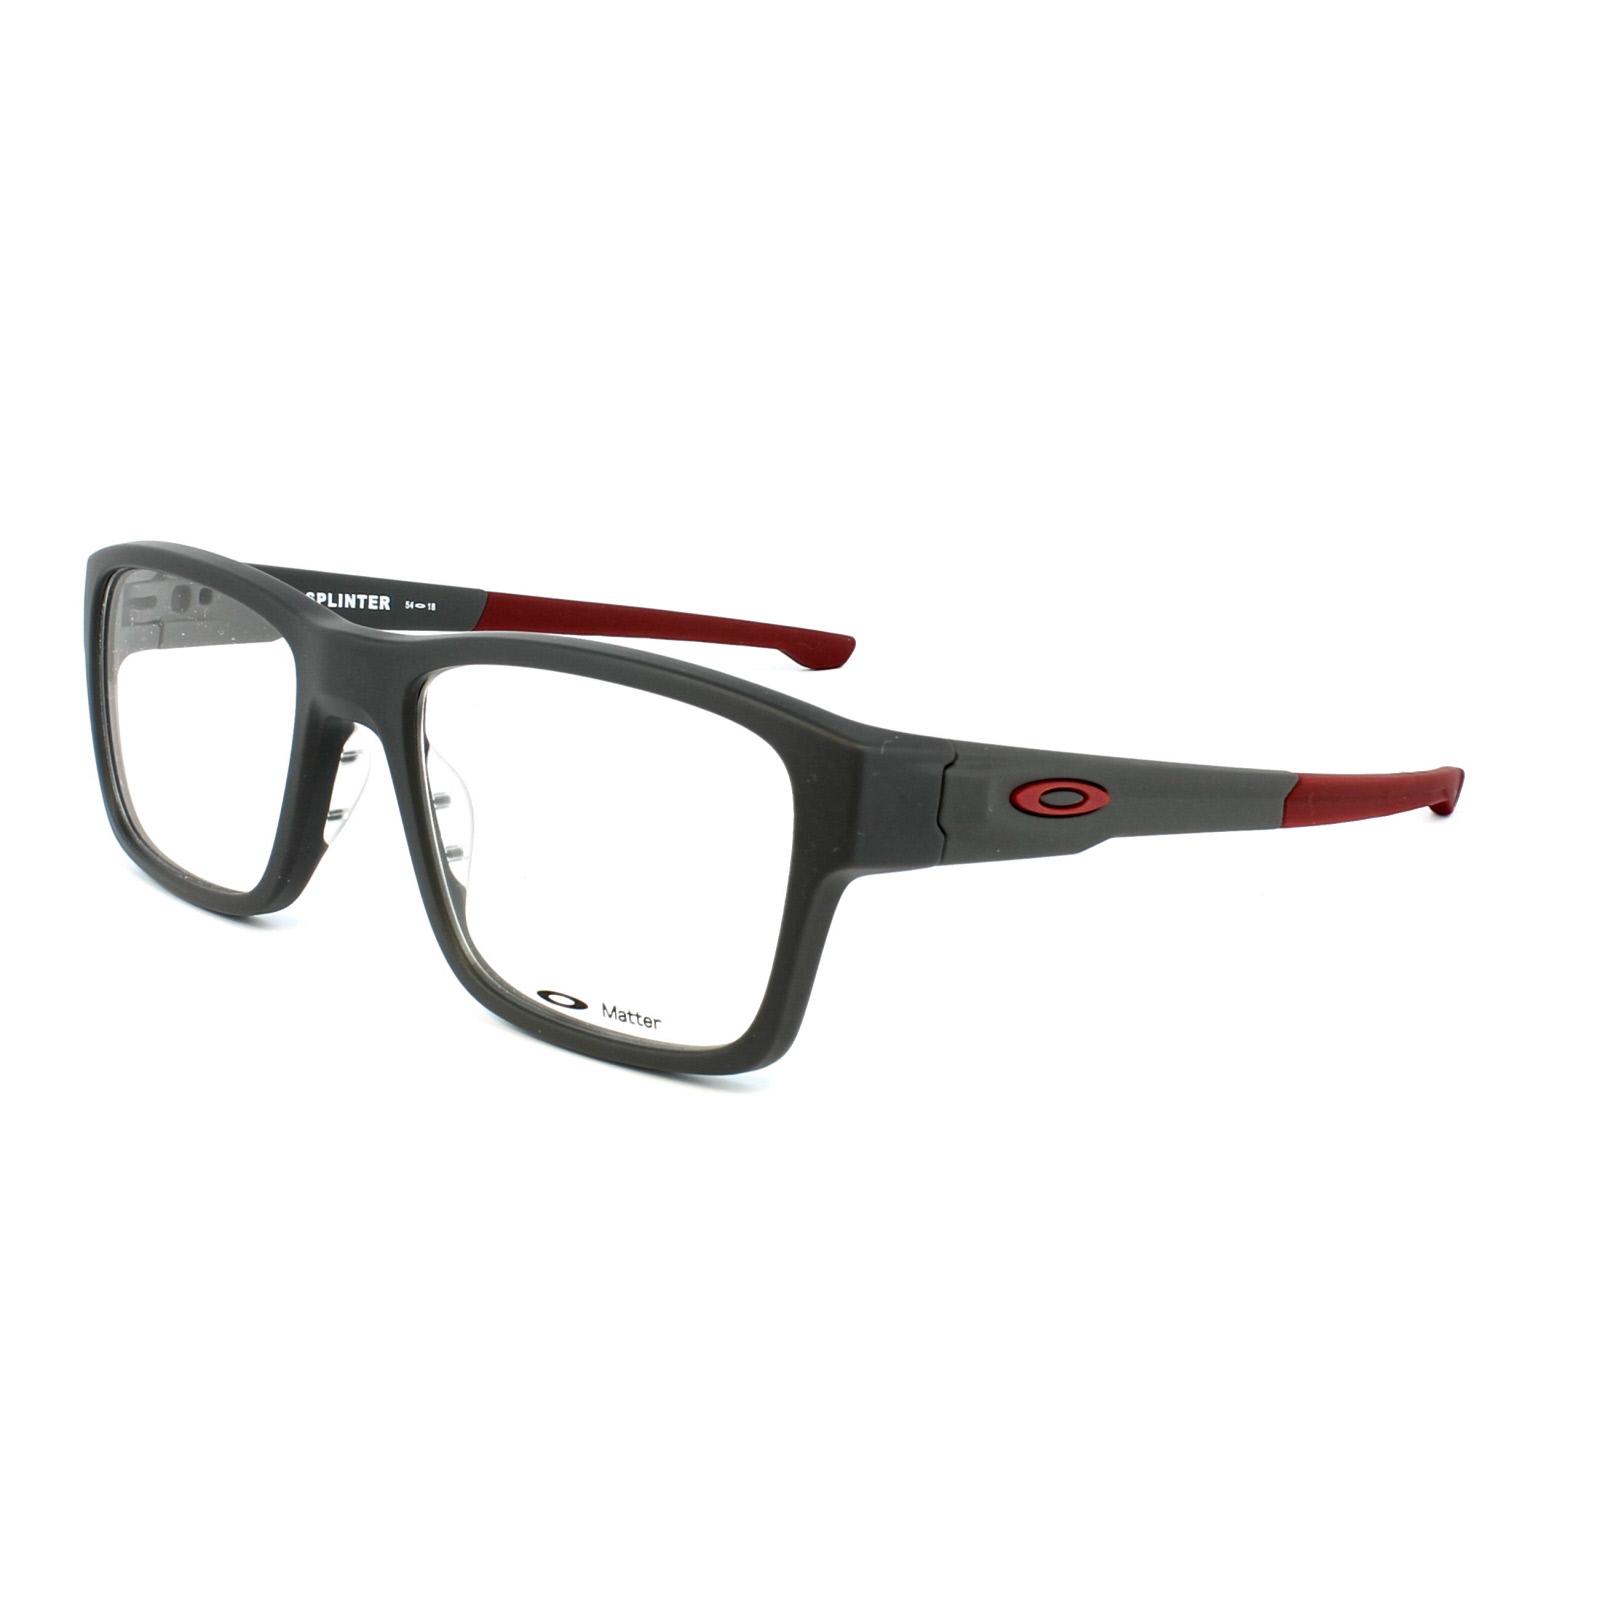 cheap oakley splinter glasses frames discounted sunglasses